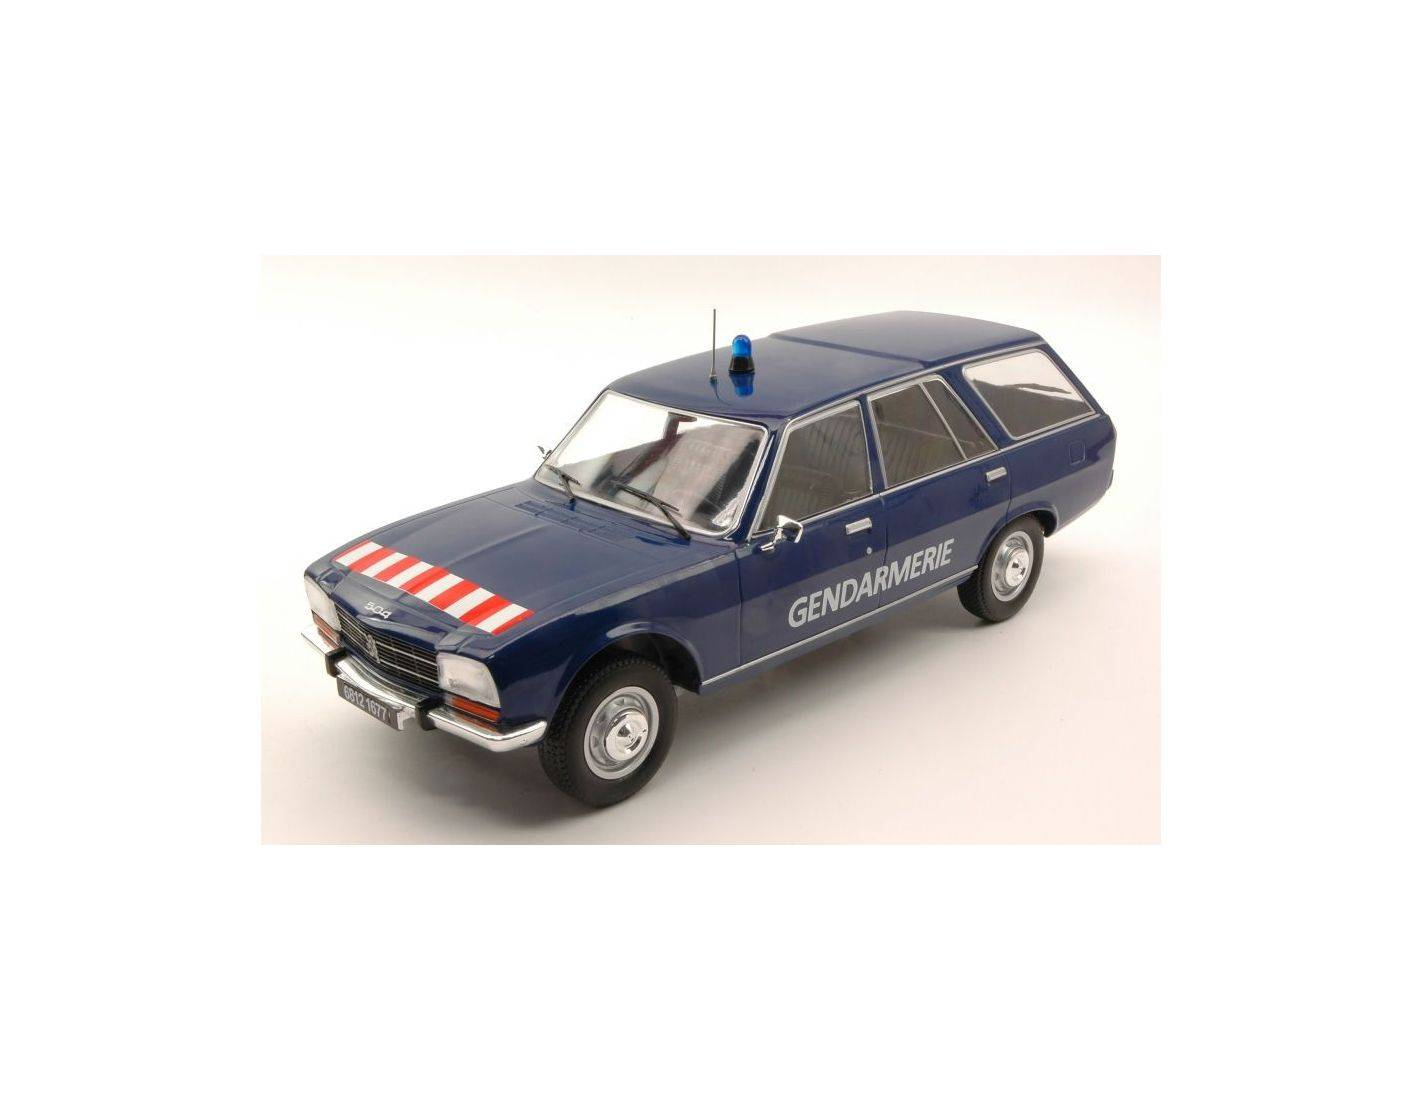 Mac due mcg18036 peugeot 504 break gendarmerie 1 18 modellino for Mac due the box